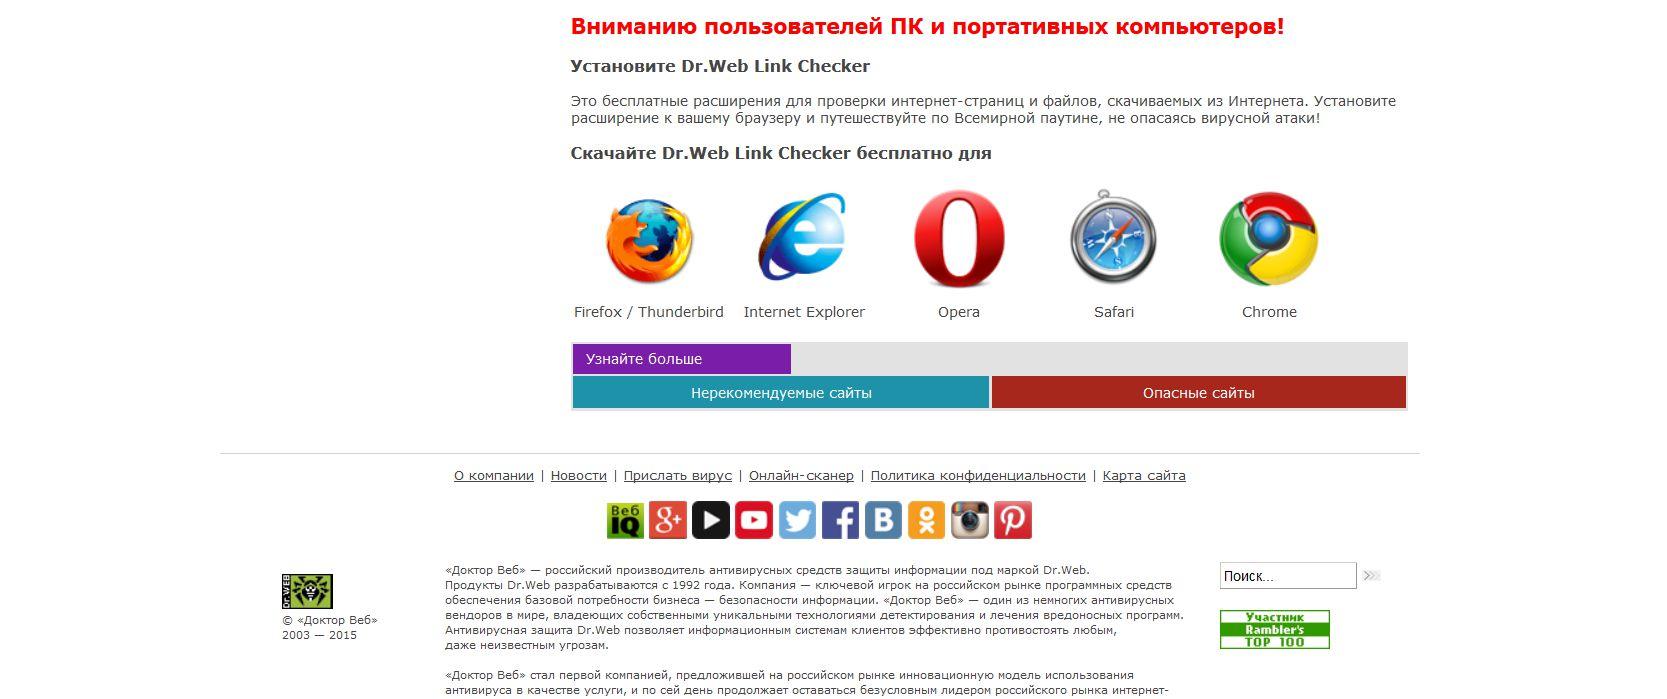 Утилита Dr.WebLinkChecker для браузеров